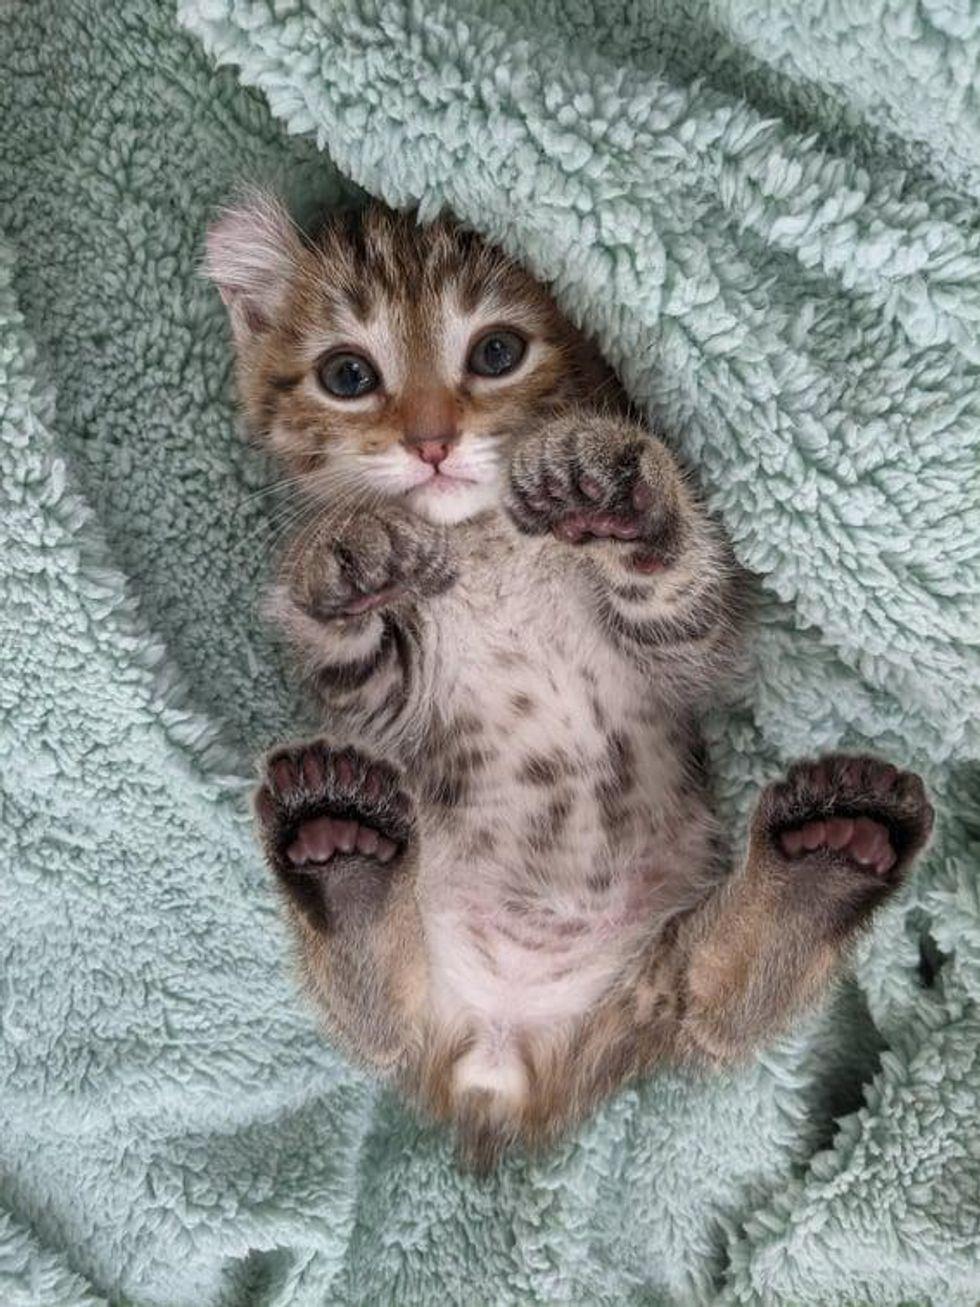 polydactyl kitten, curled ears